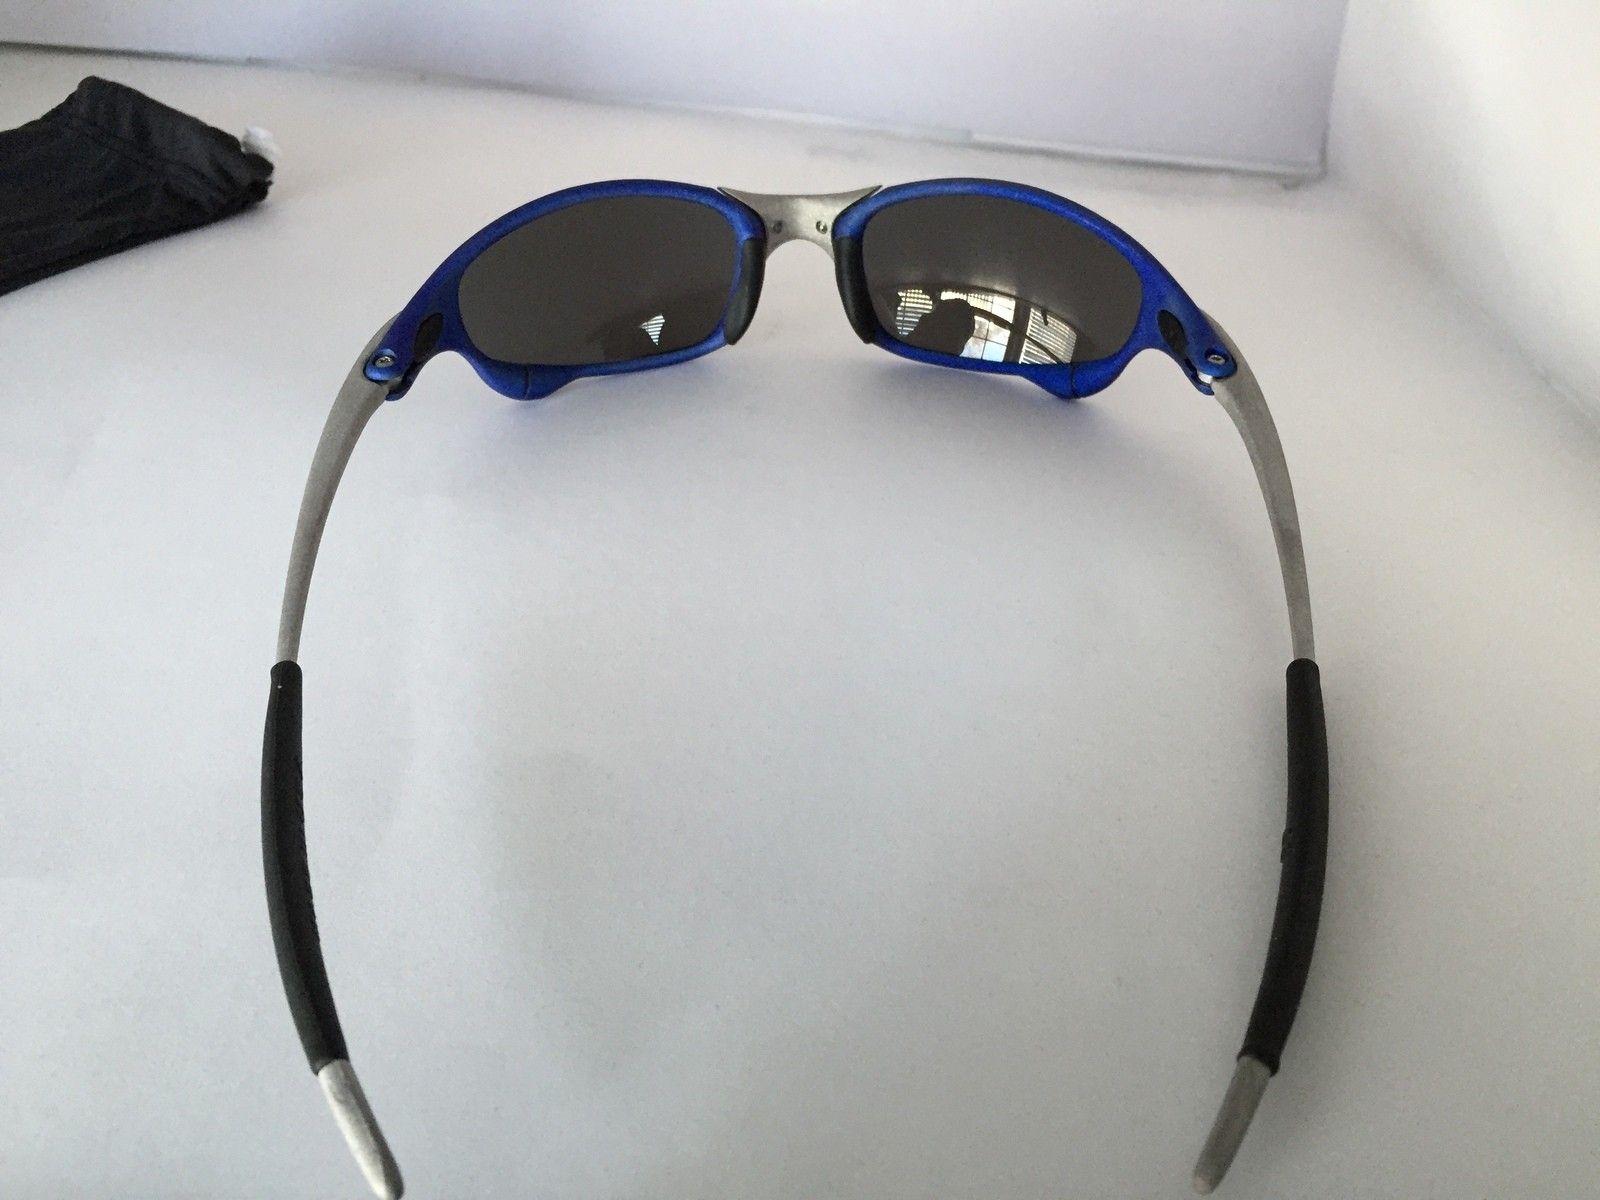 Anodized Juliet Dallas Cowboys colors Blue/Silver w/ OEM Ice Lenses - IMG_1788.JPG